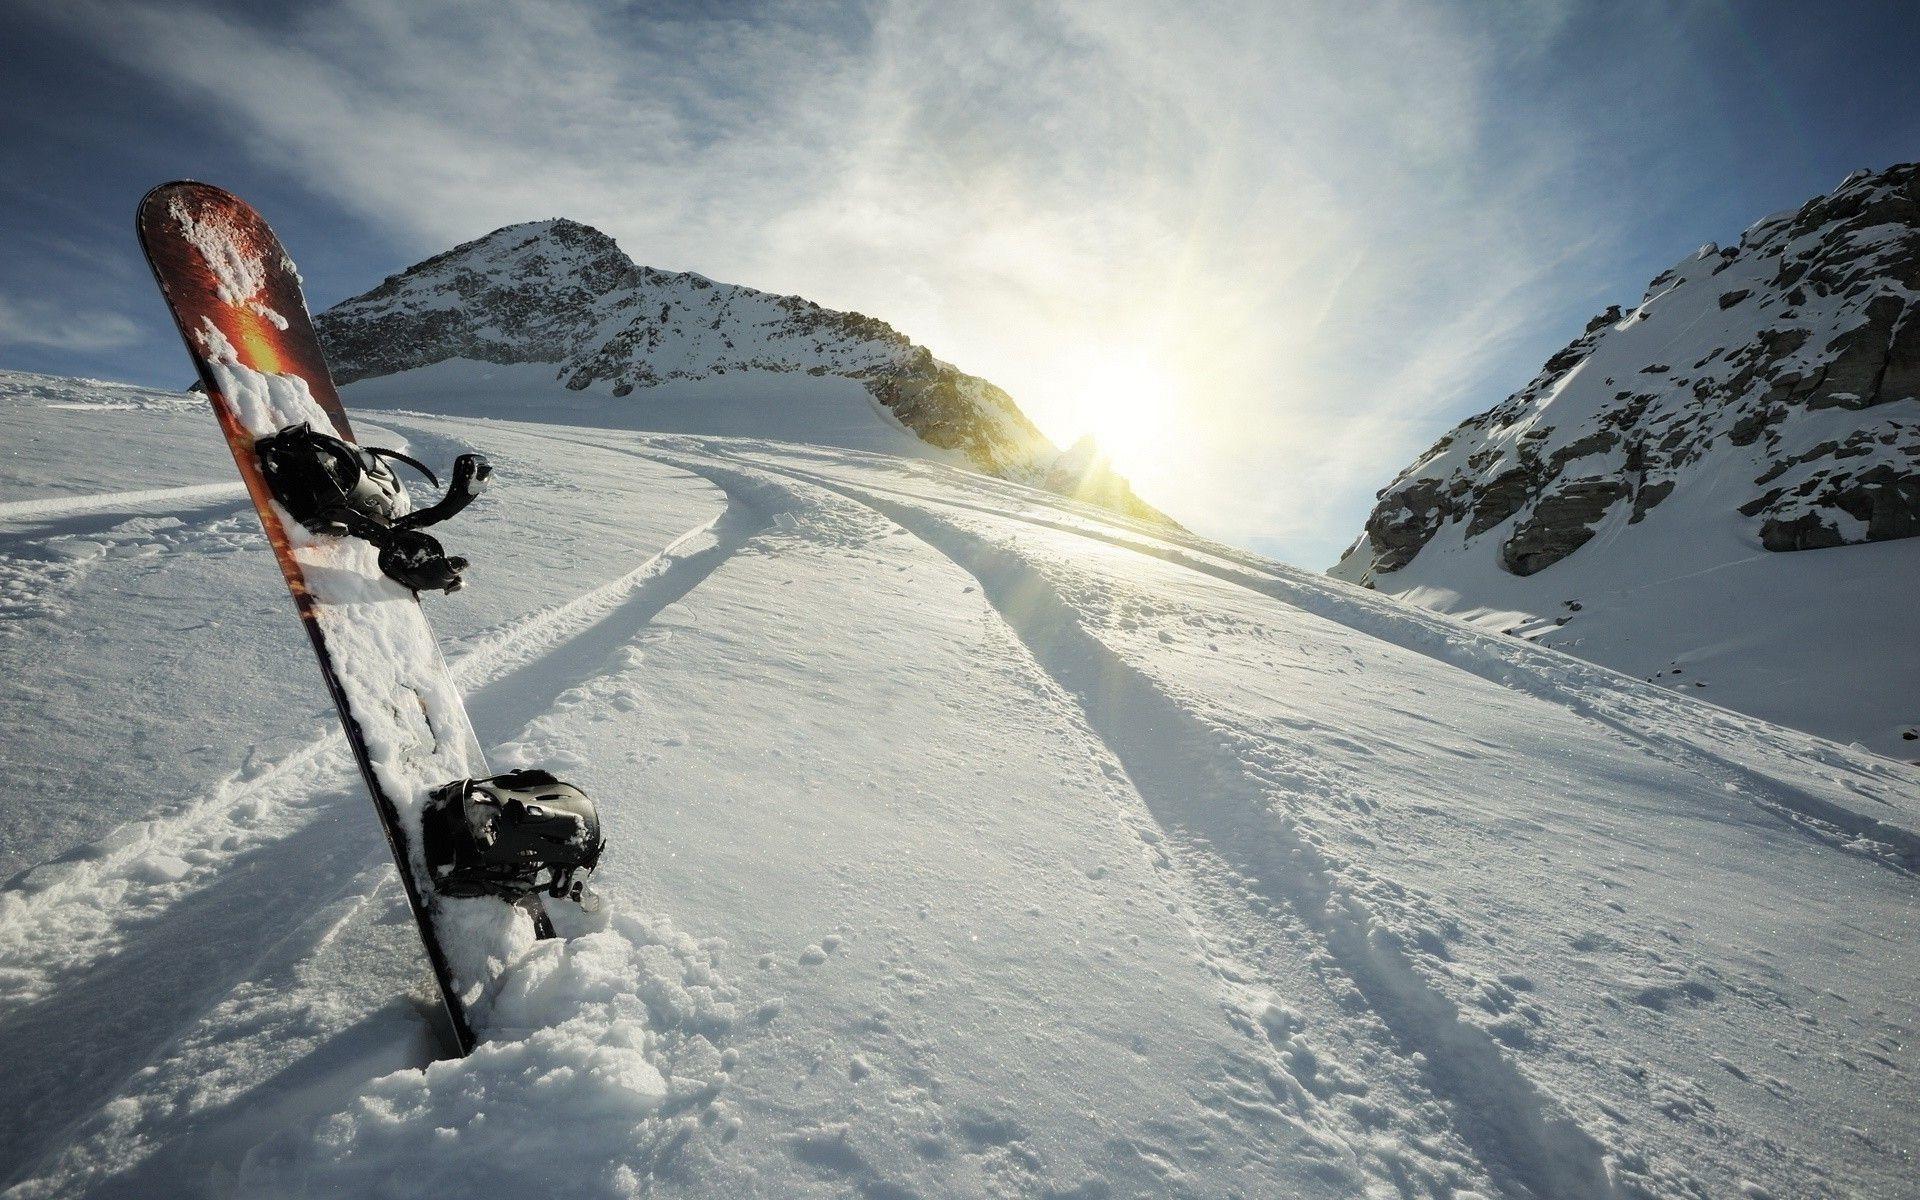 snowboard wallpaper hd  Snowboarding Wallpaper HD (72  images)